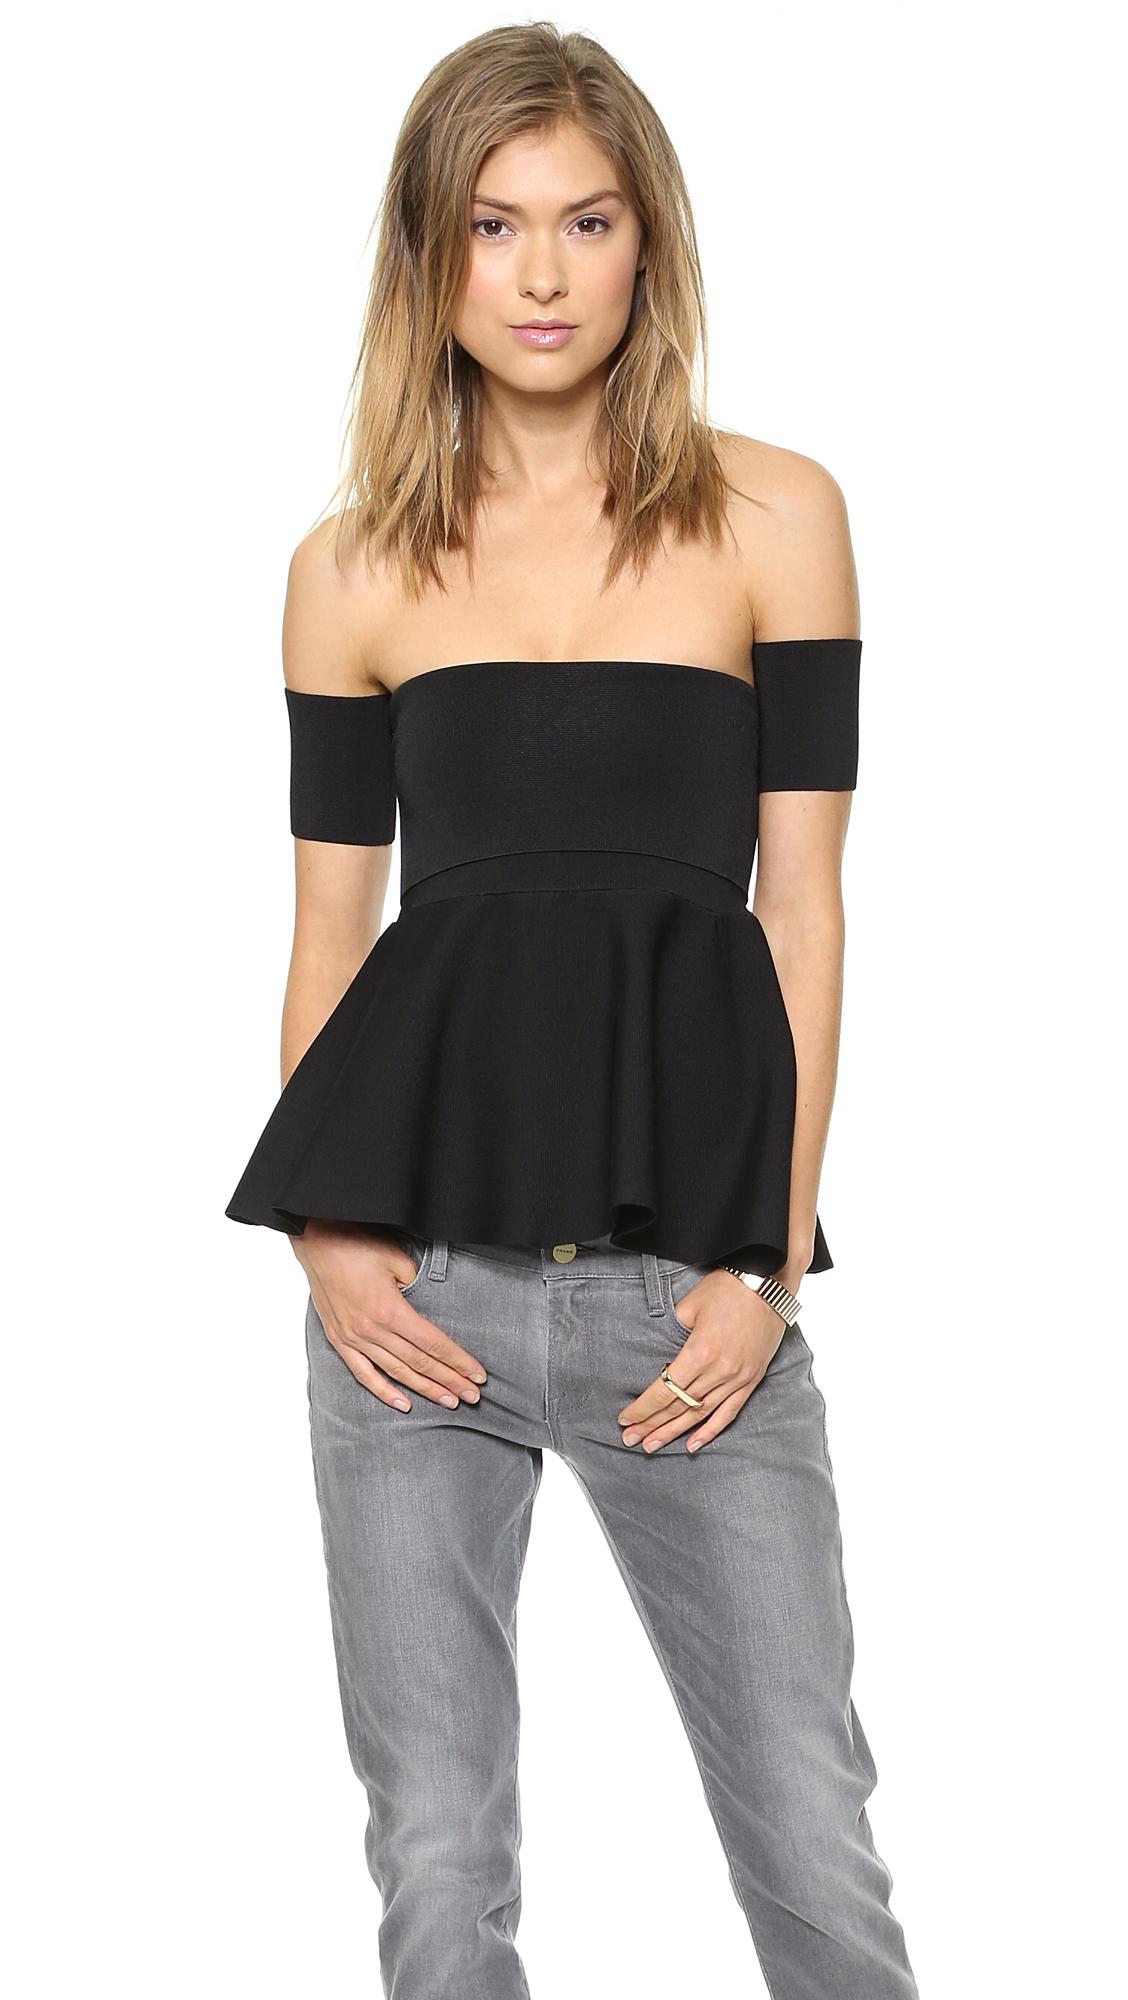 Black t shirt dress brandy melville - Gallery